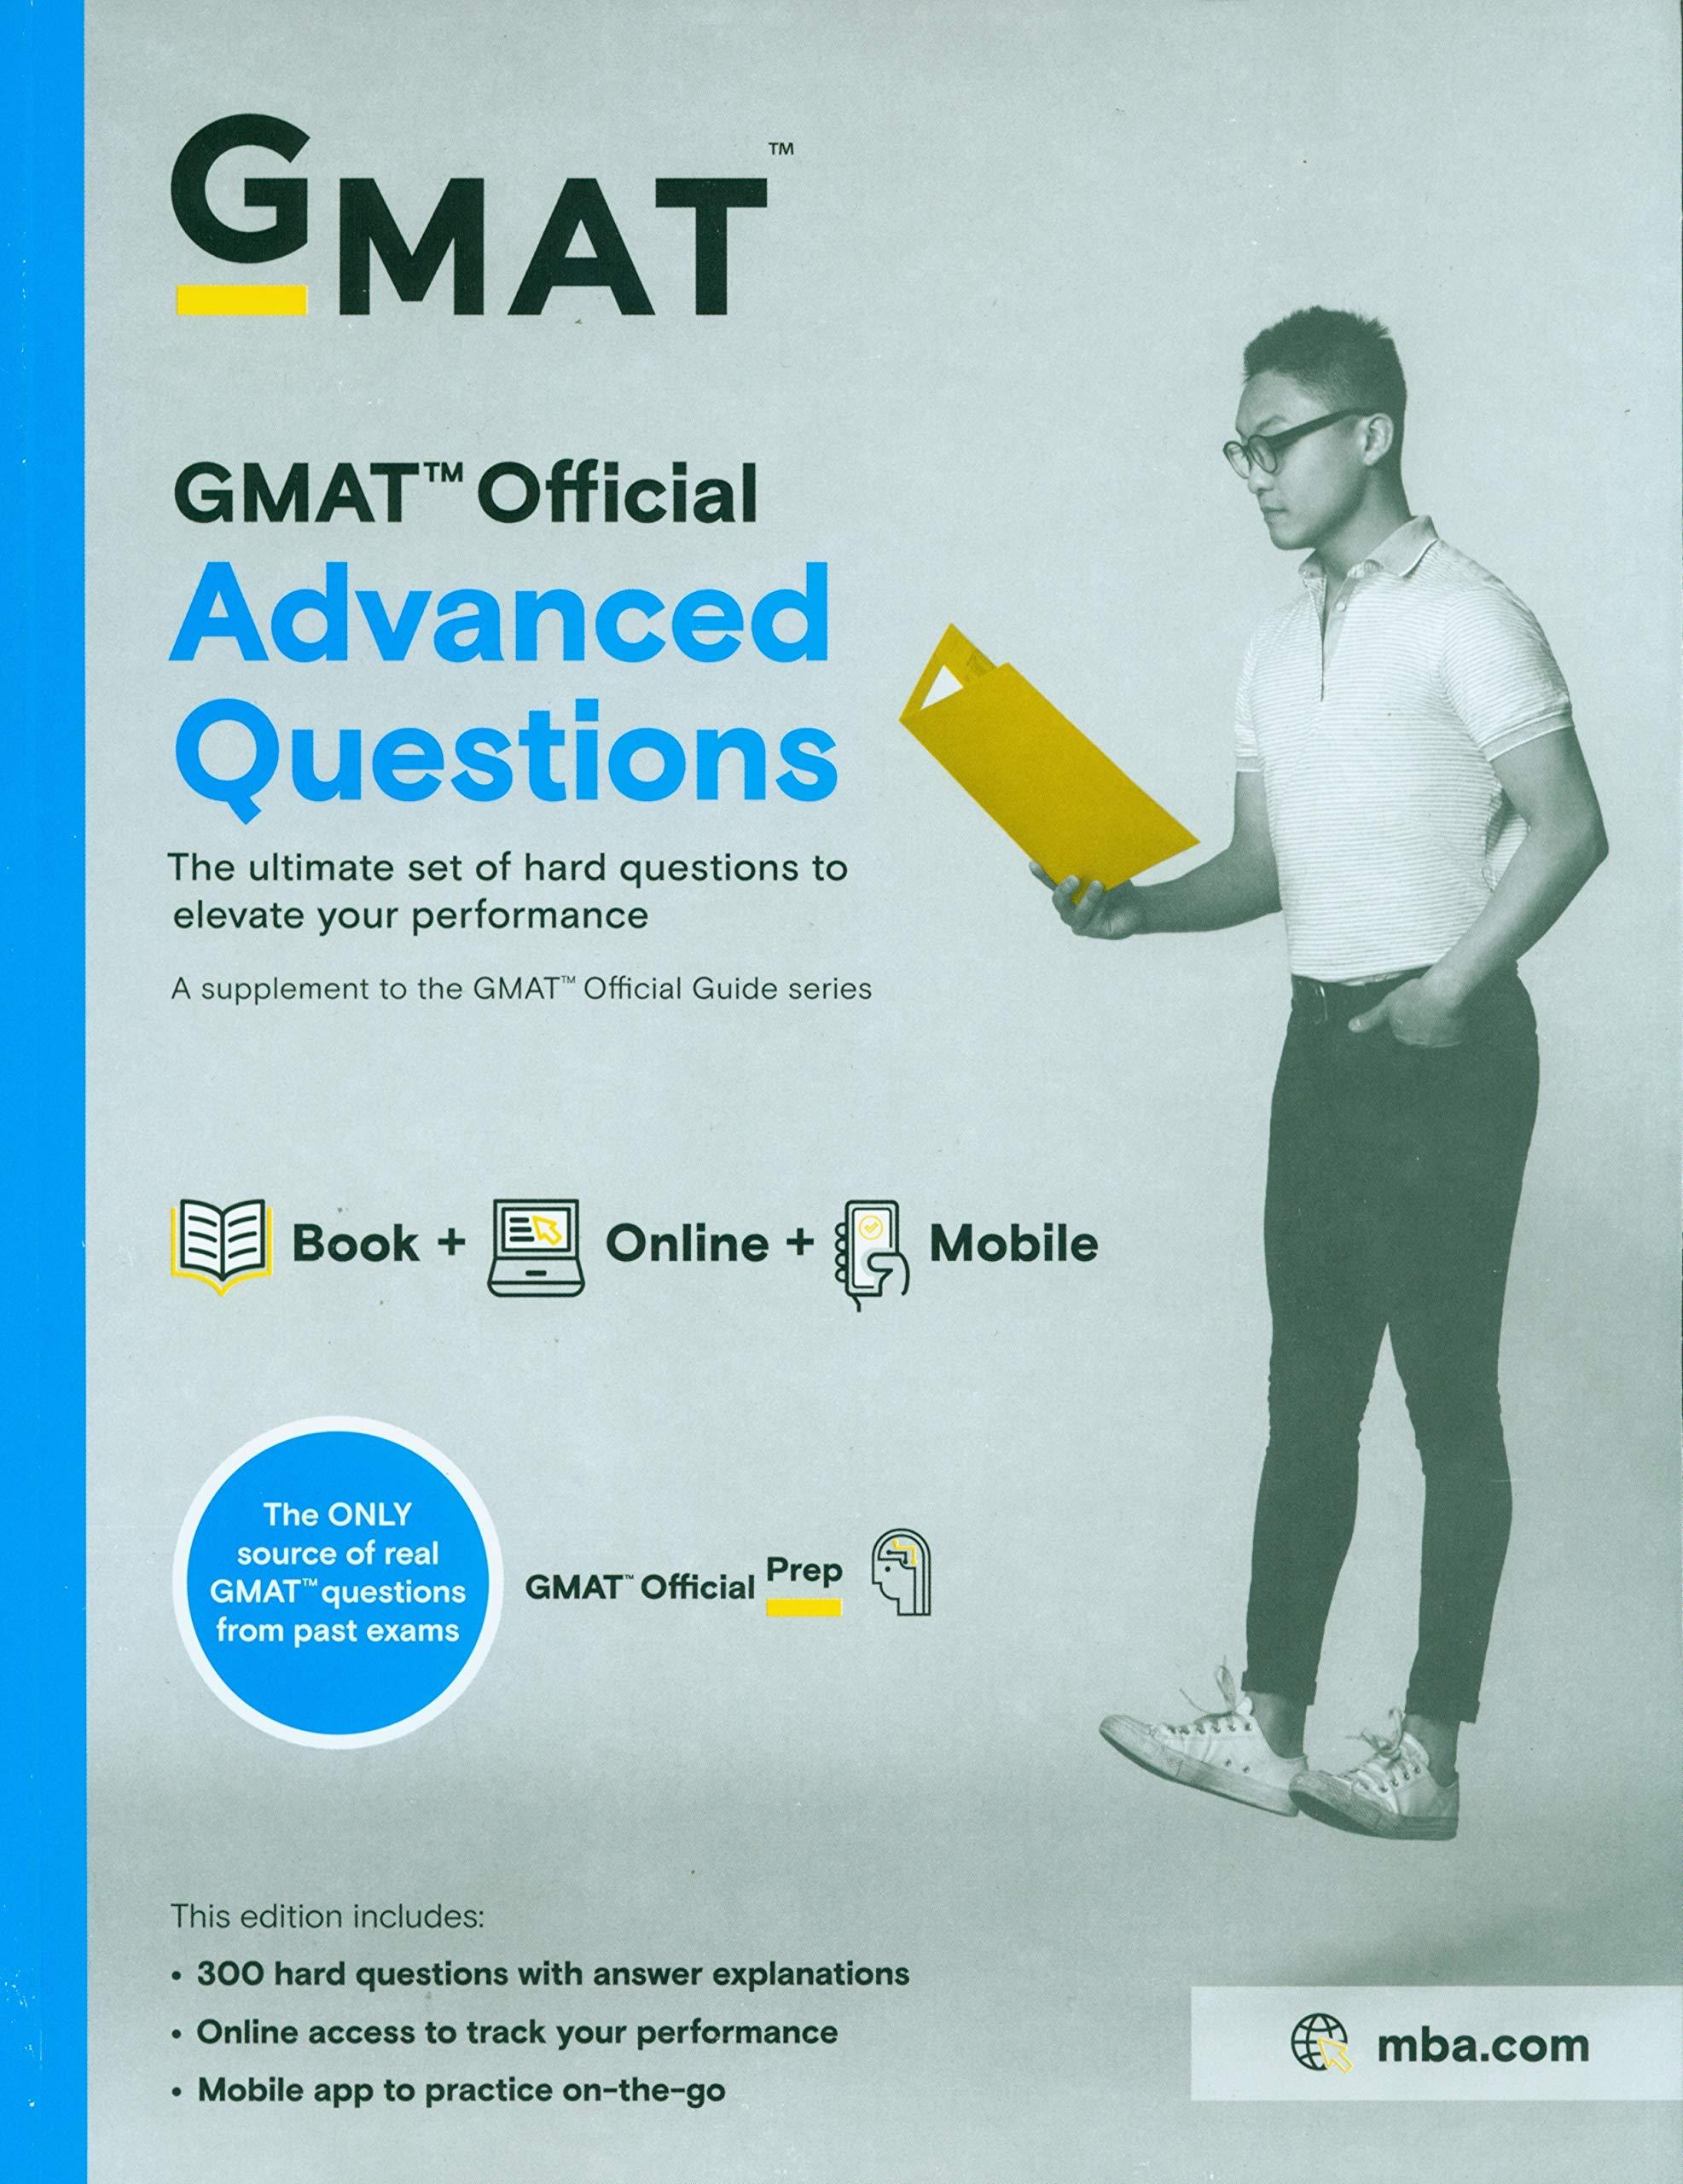 GMAT Official Advanced Questions